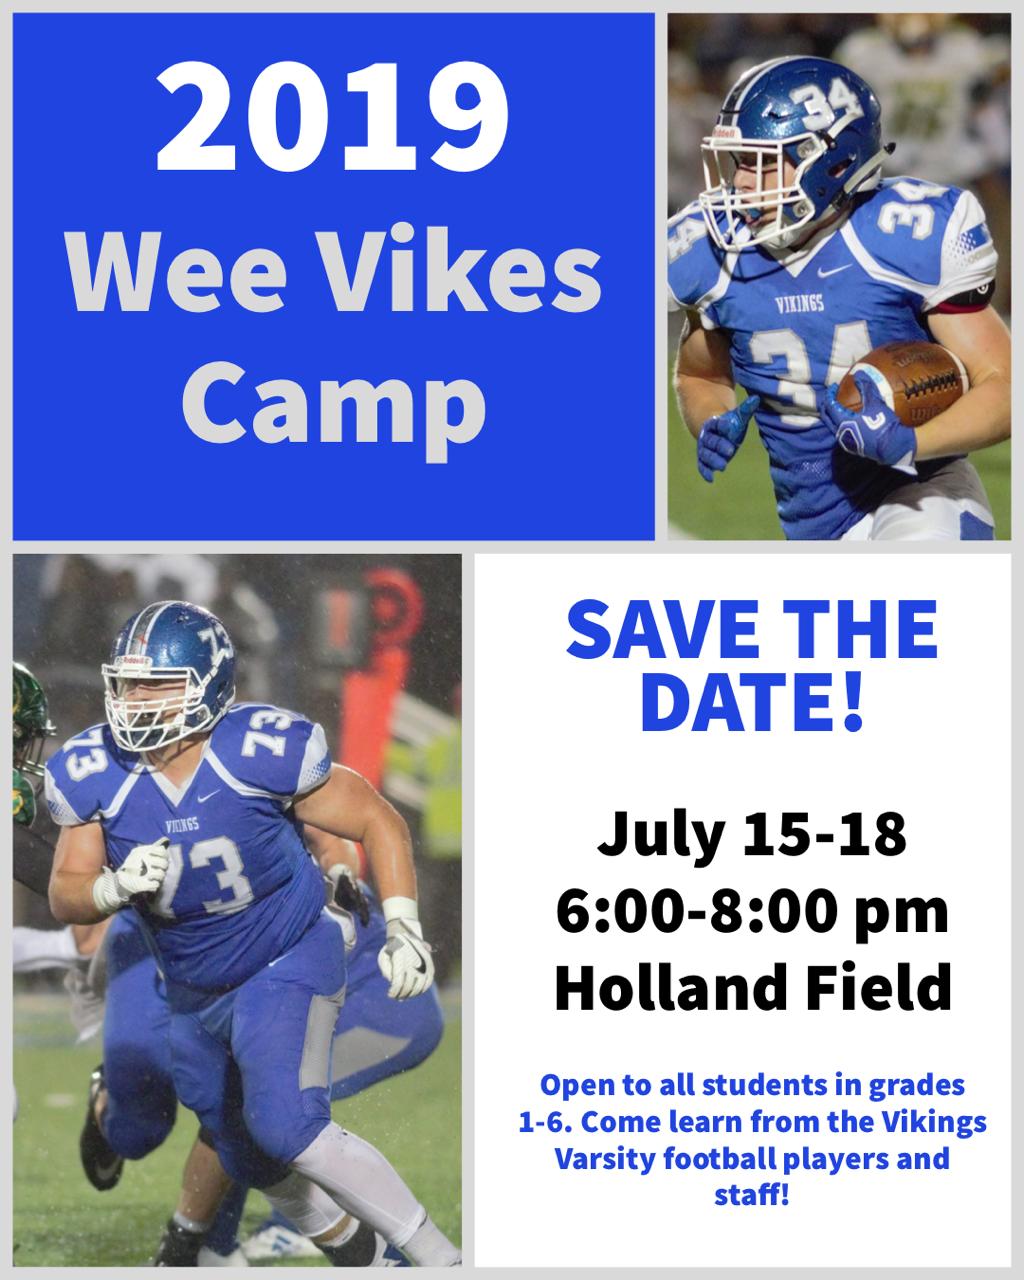 2019 Wee Vikes Football Camp